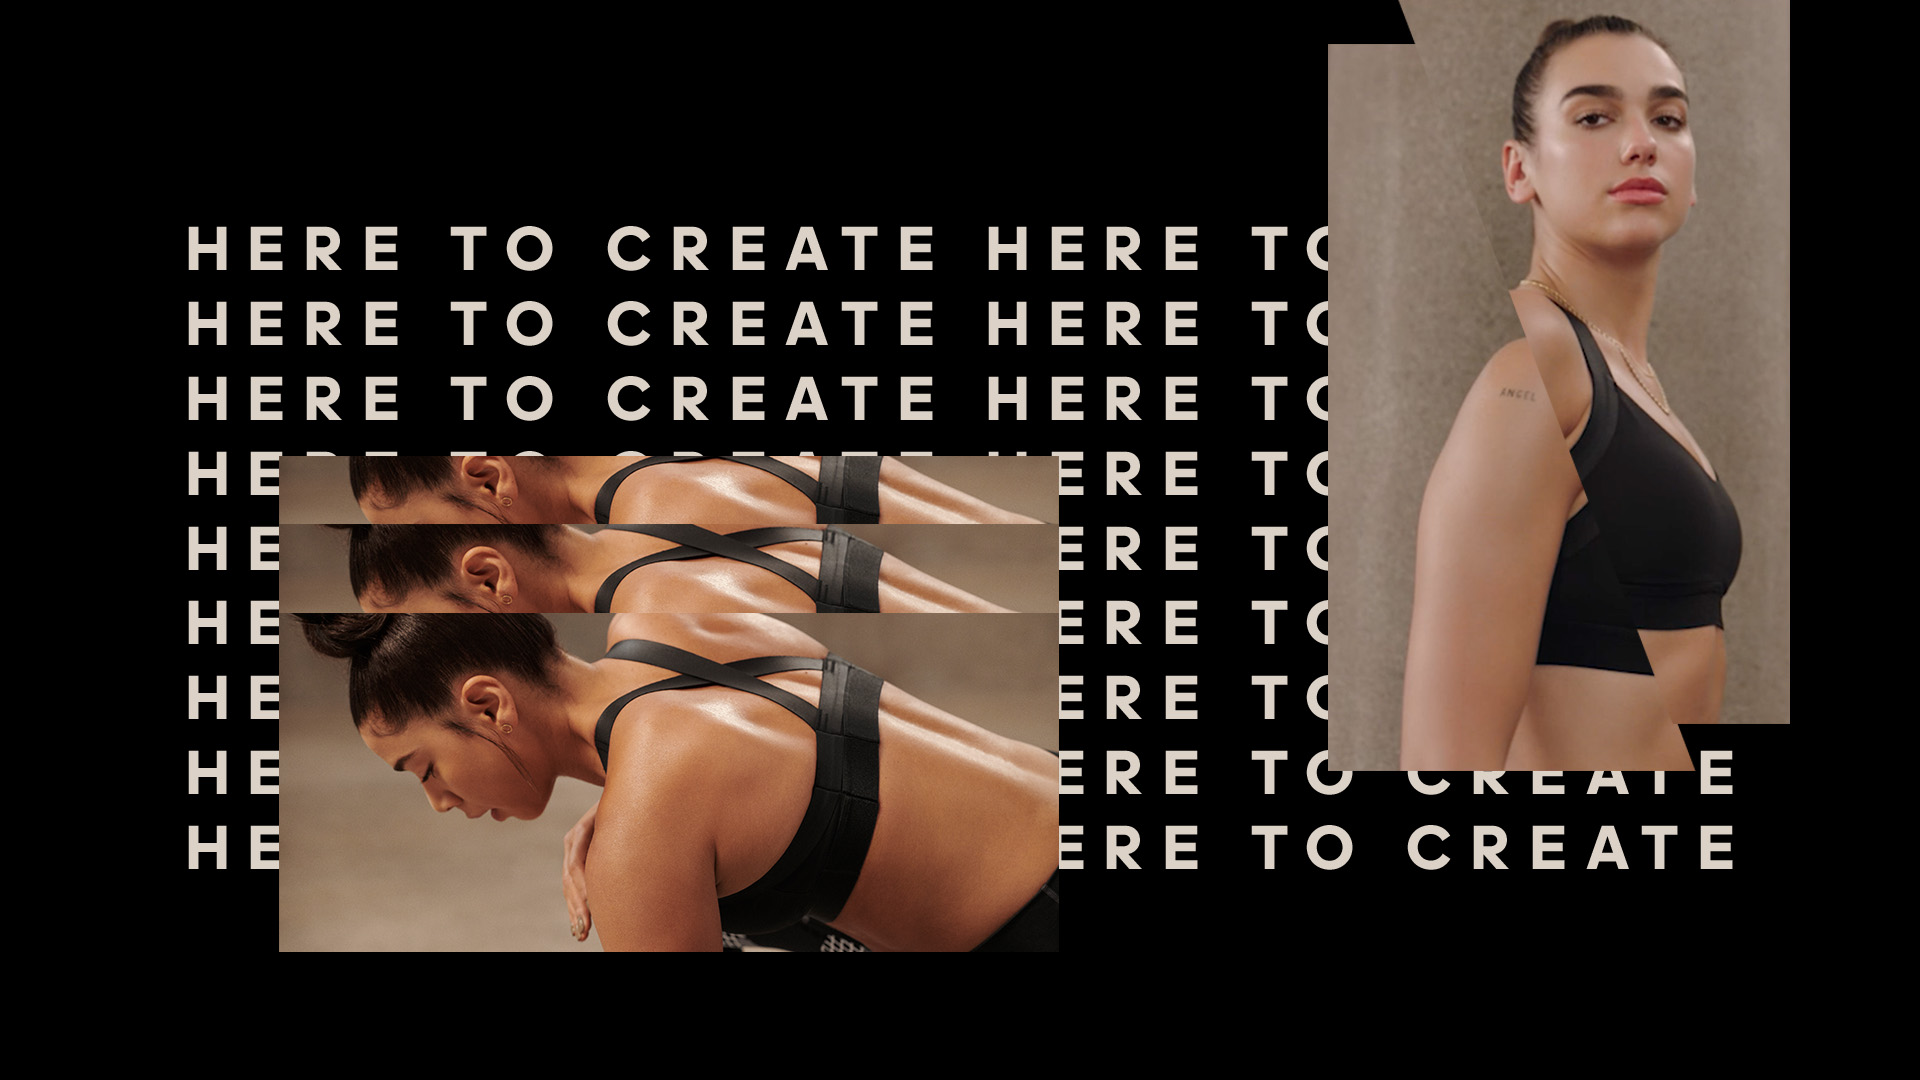 adidasSC_HeroFilm_16-9_02_F02E.jpg